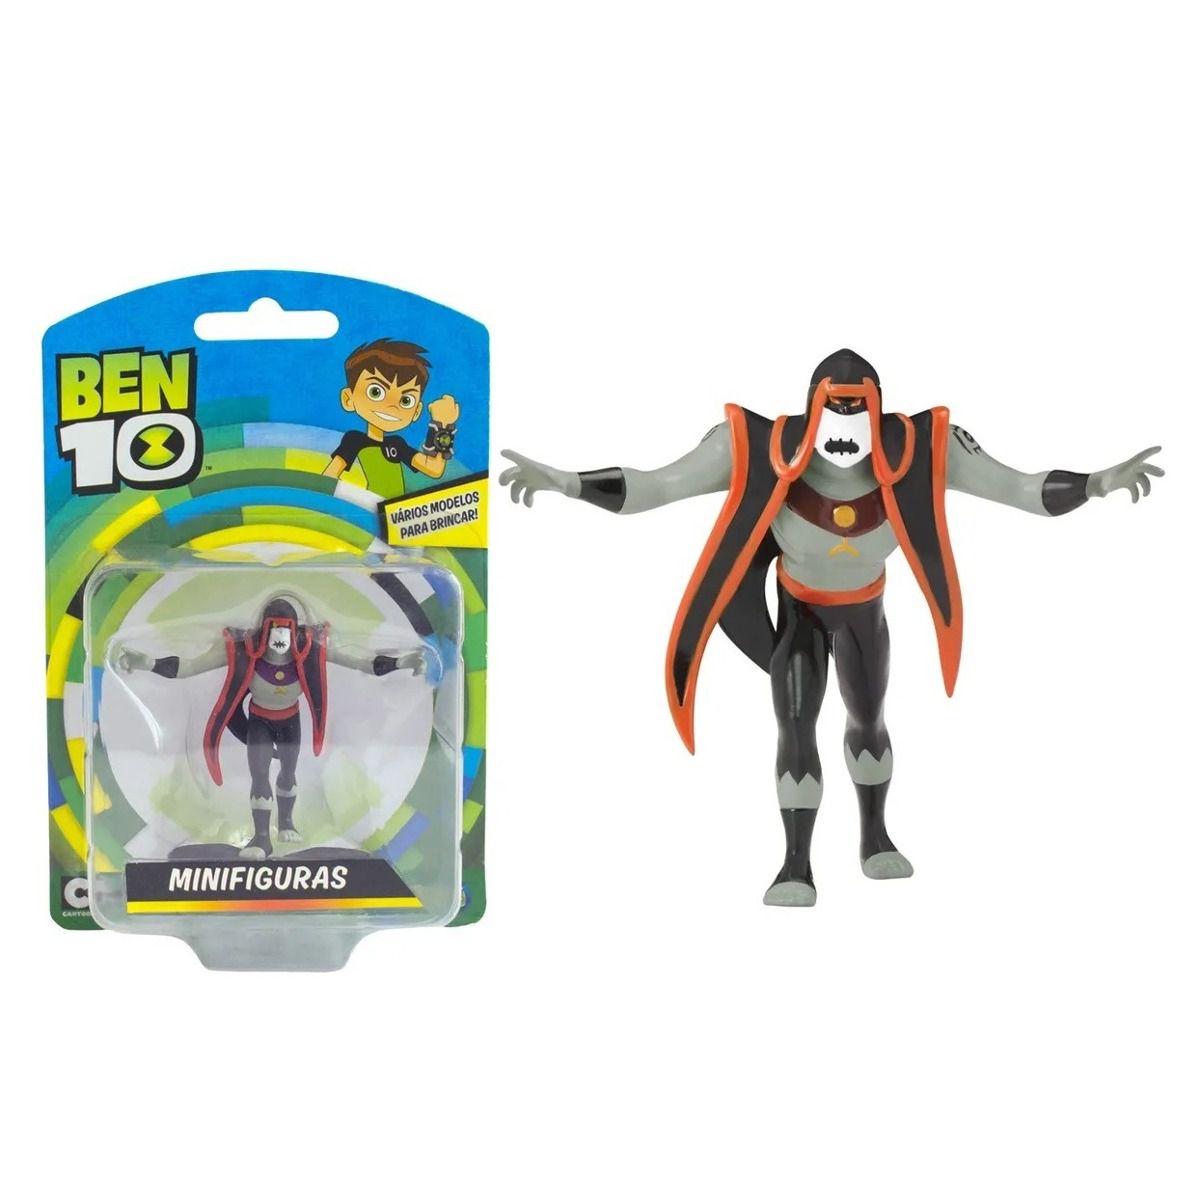 Mini Figuras - Ben 10 - Boneco Hex - Original Sunny